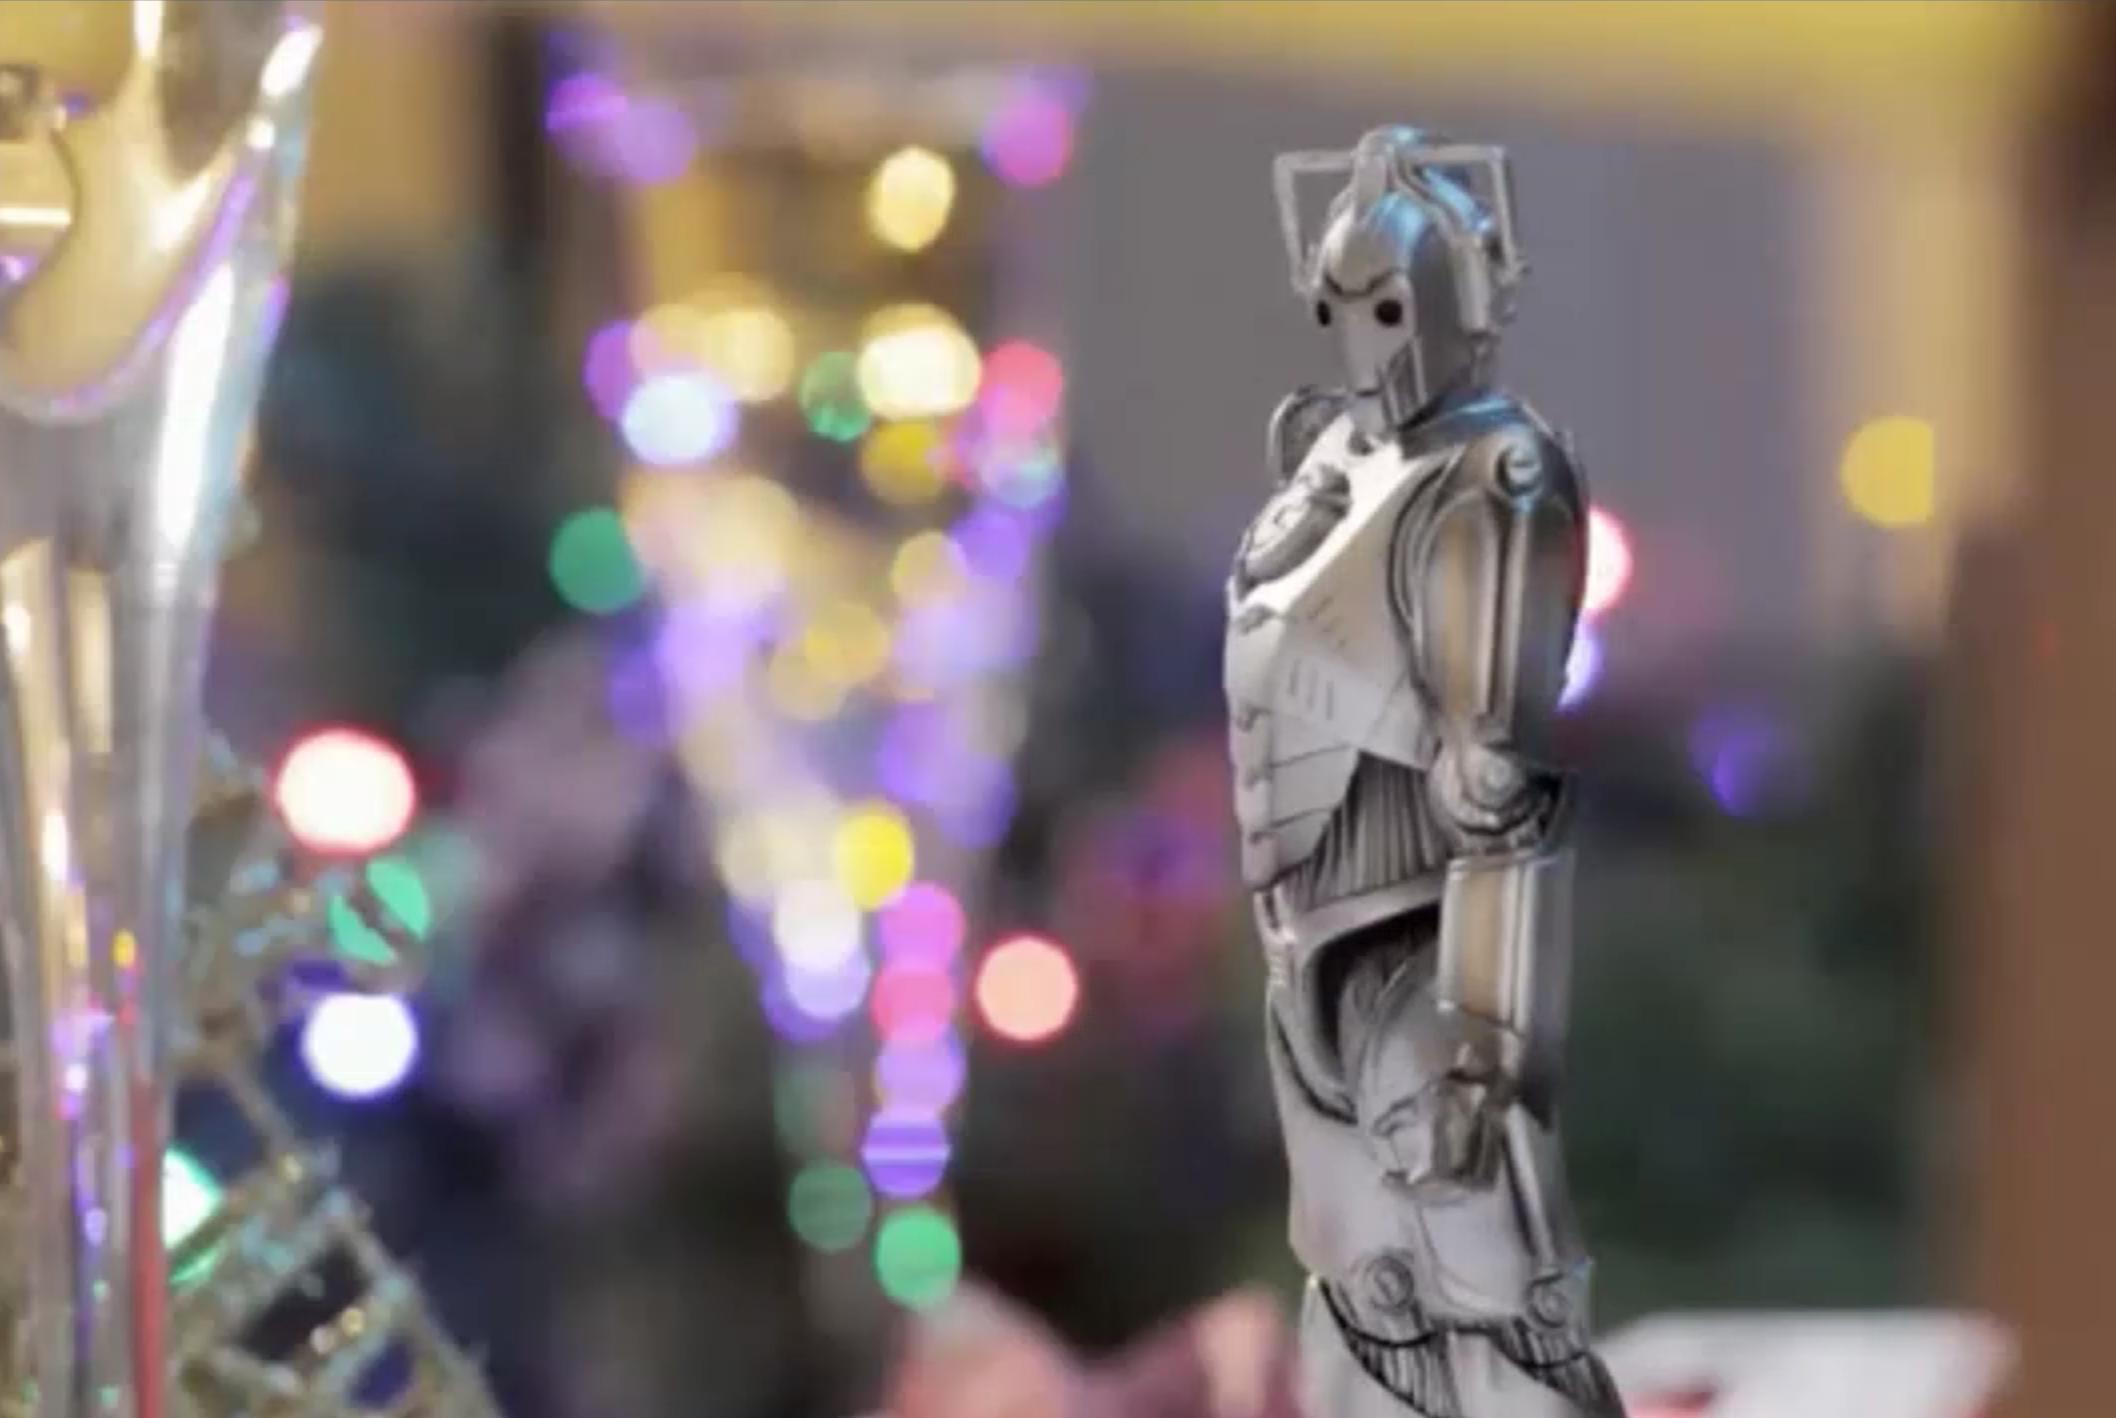 The Christmas cyberman